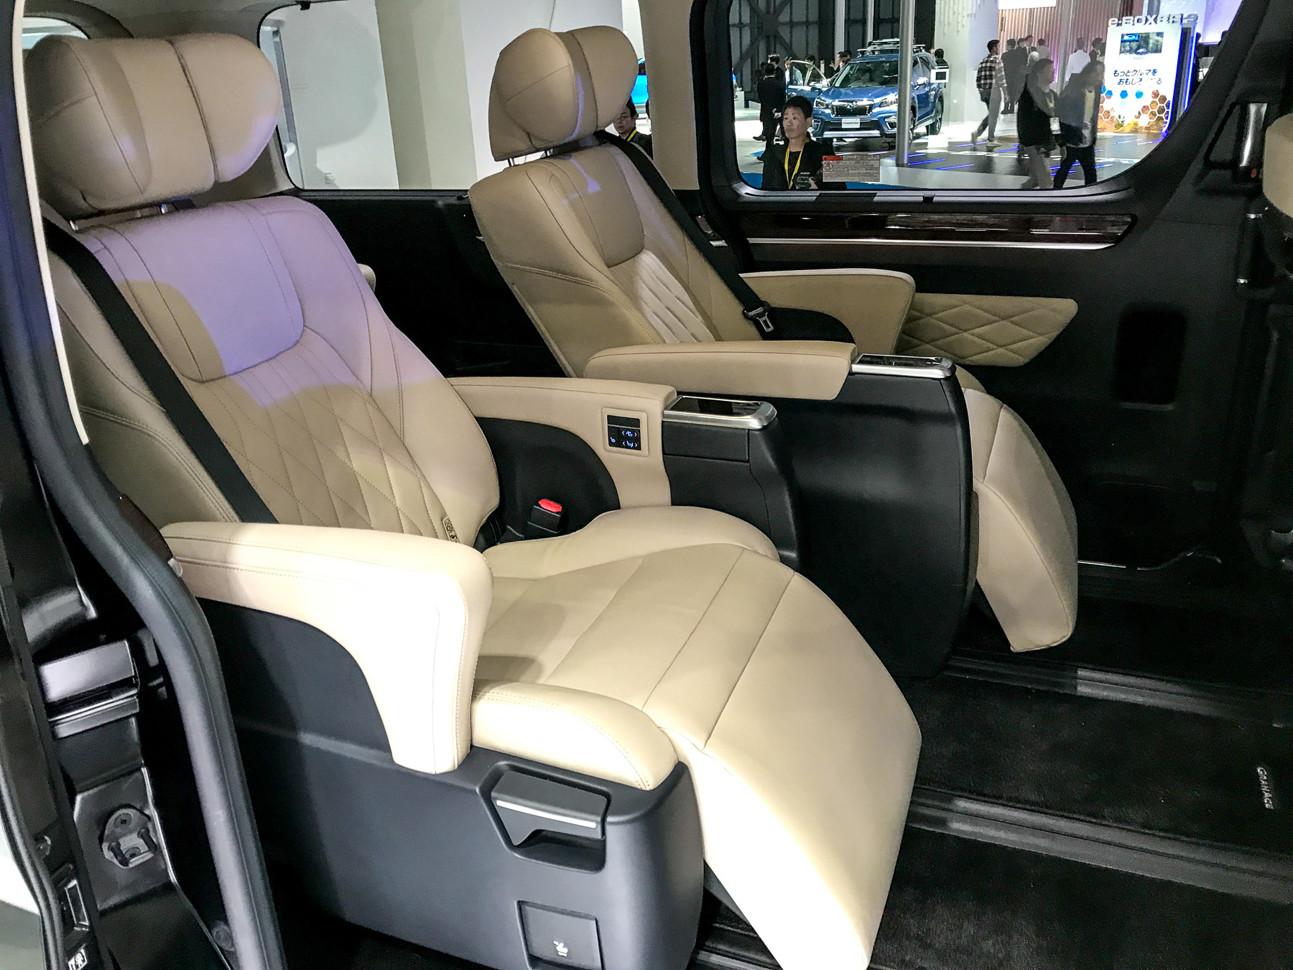 Автосалон в Токио: представлена по-настоящему богатая Toyota 3